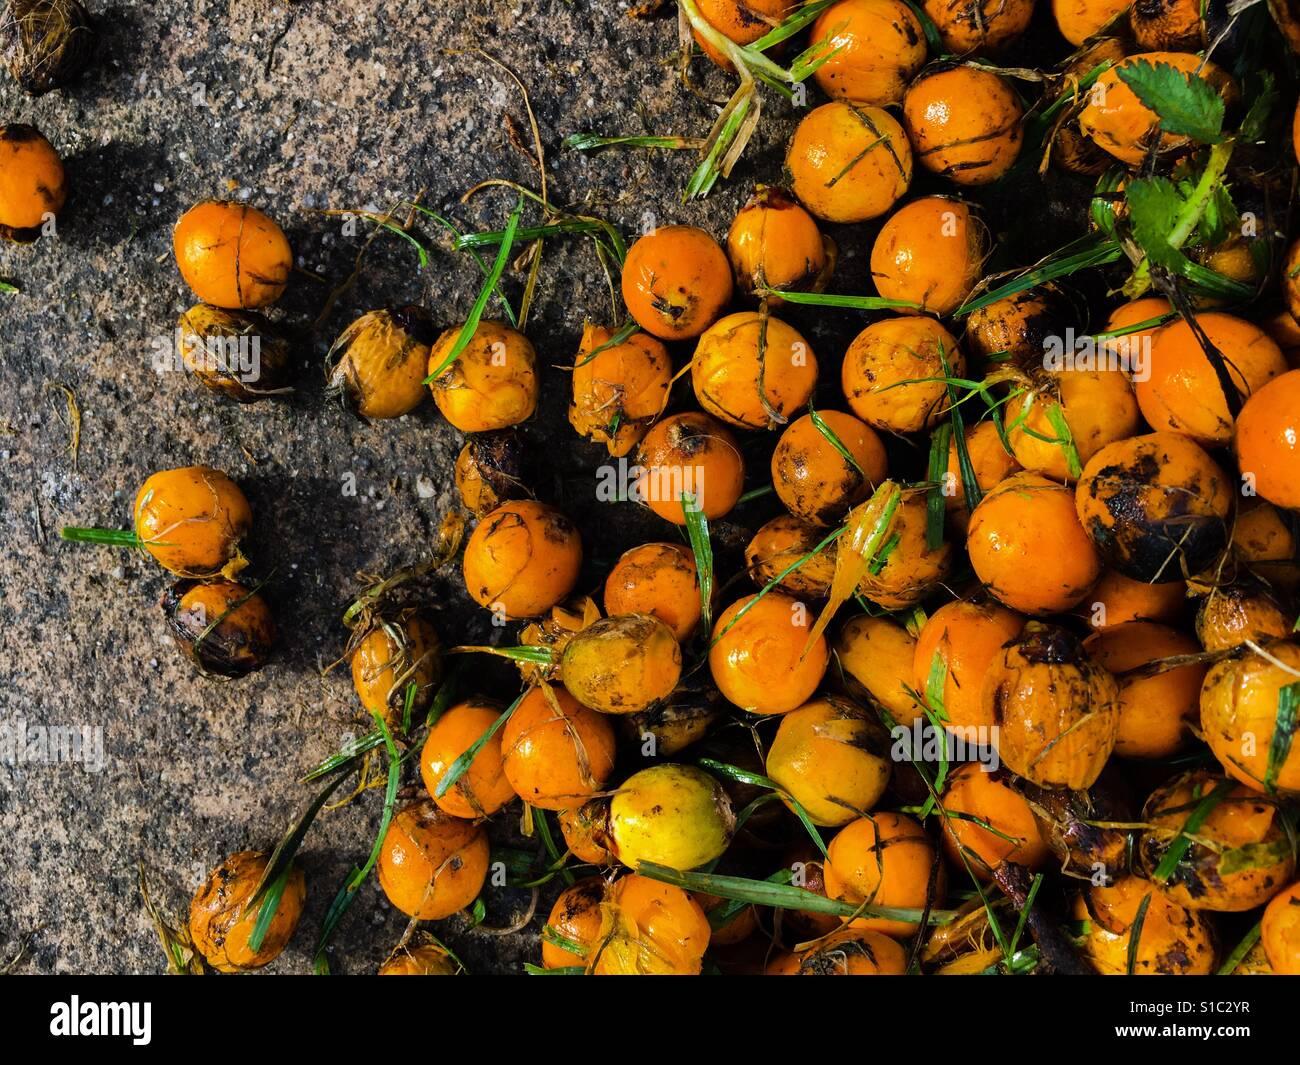 Vibrant orange yellow palm tree fruit close up against wet earthy pavement - Stock Image